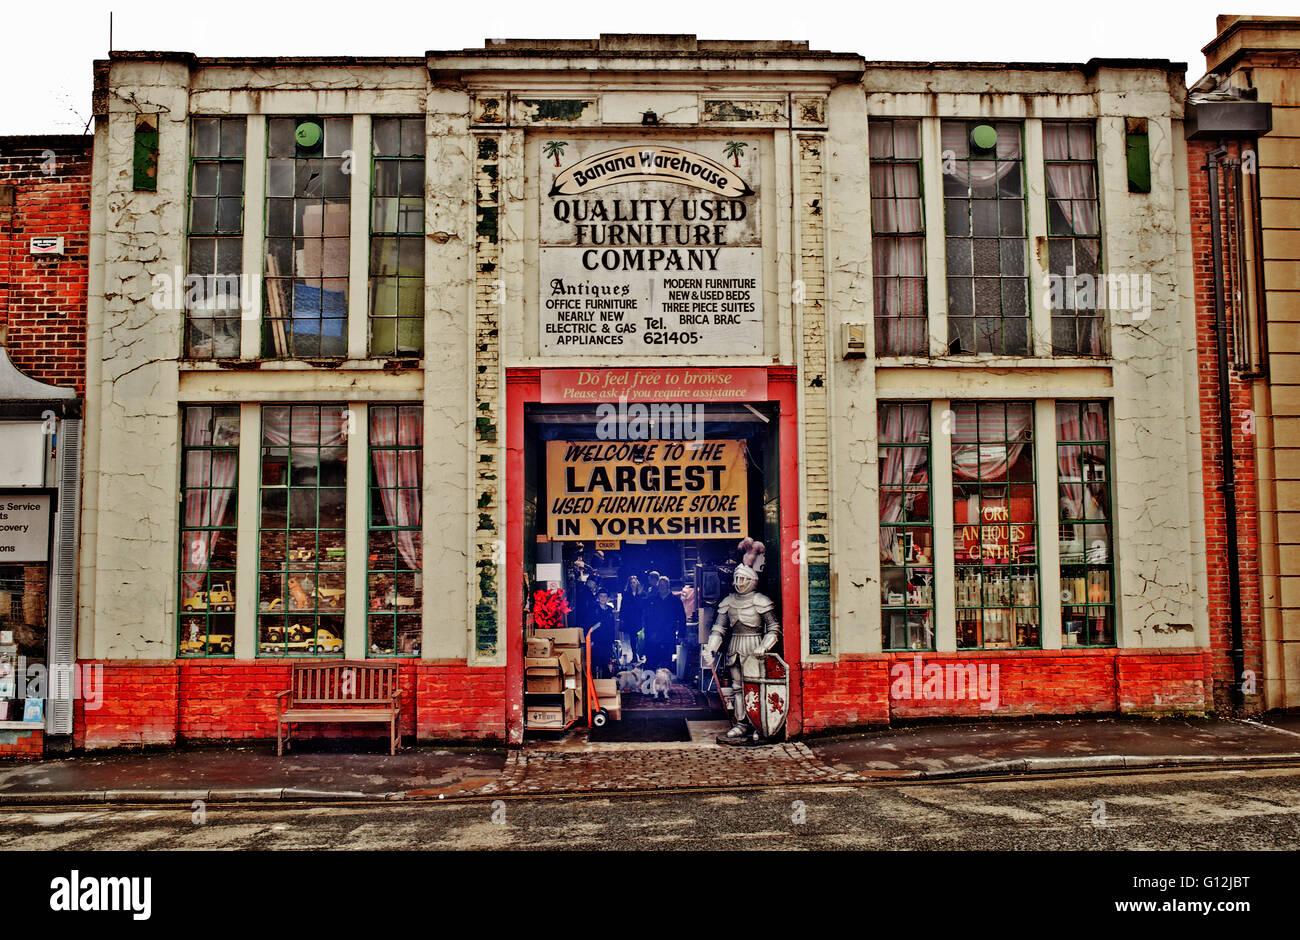 Banana Warehouse, York - Stock Image